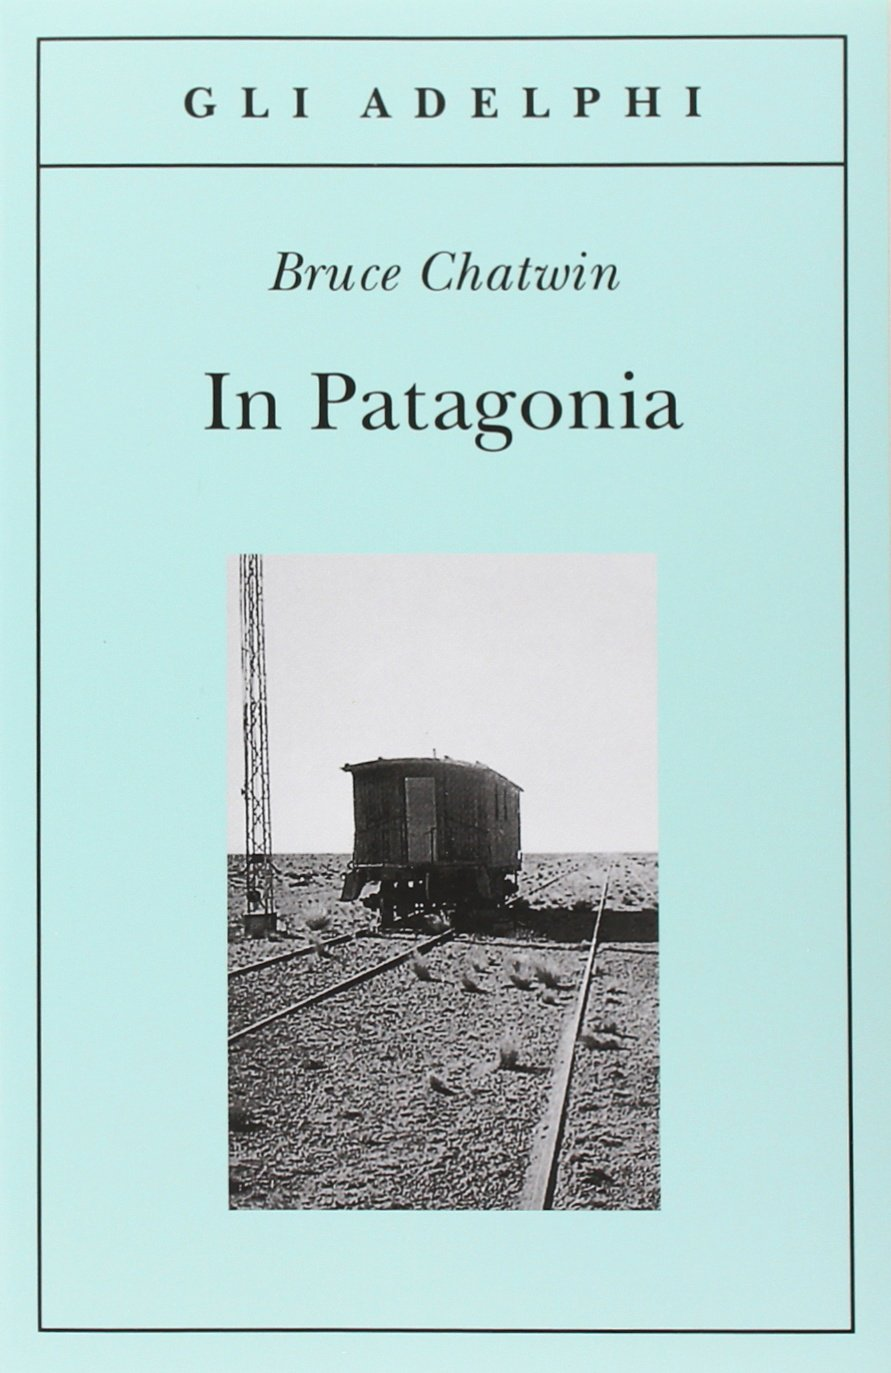 In Patagonia (Italian Edition) (Italian) Paperback